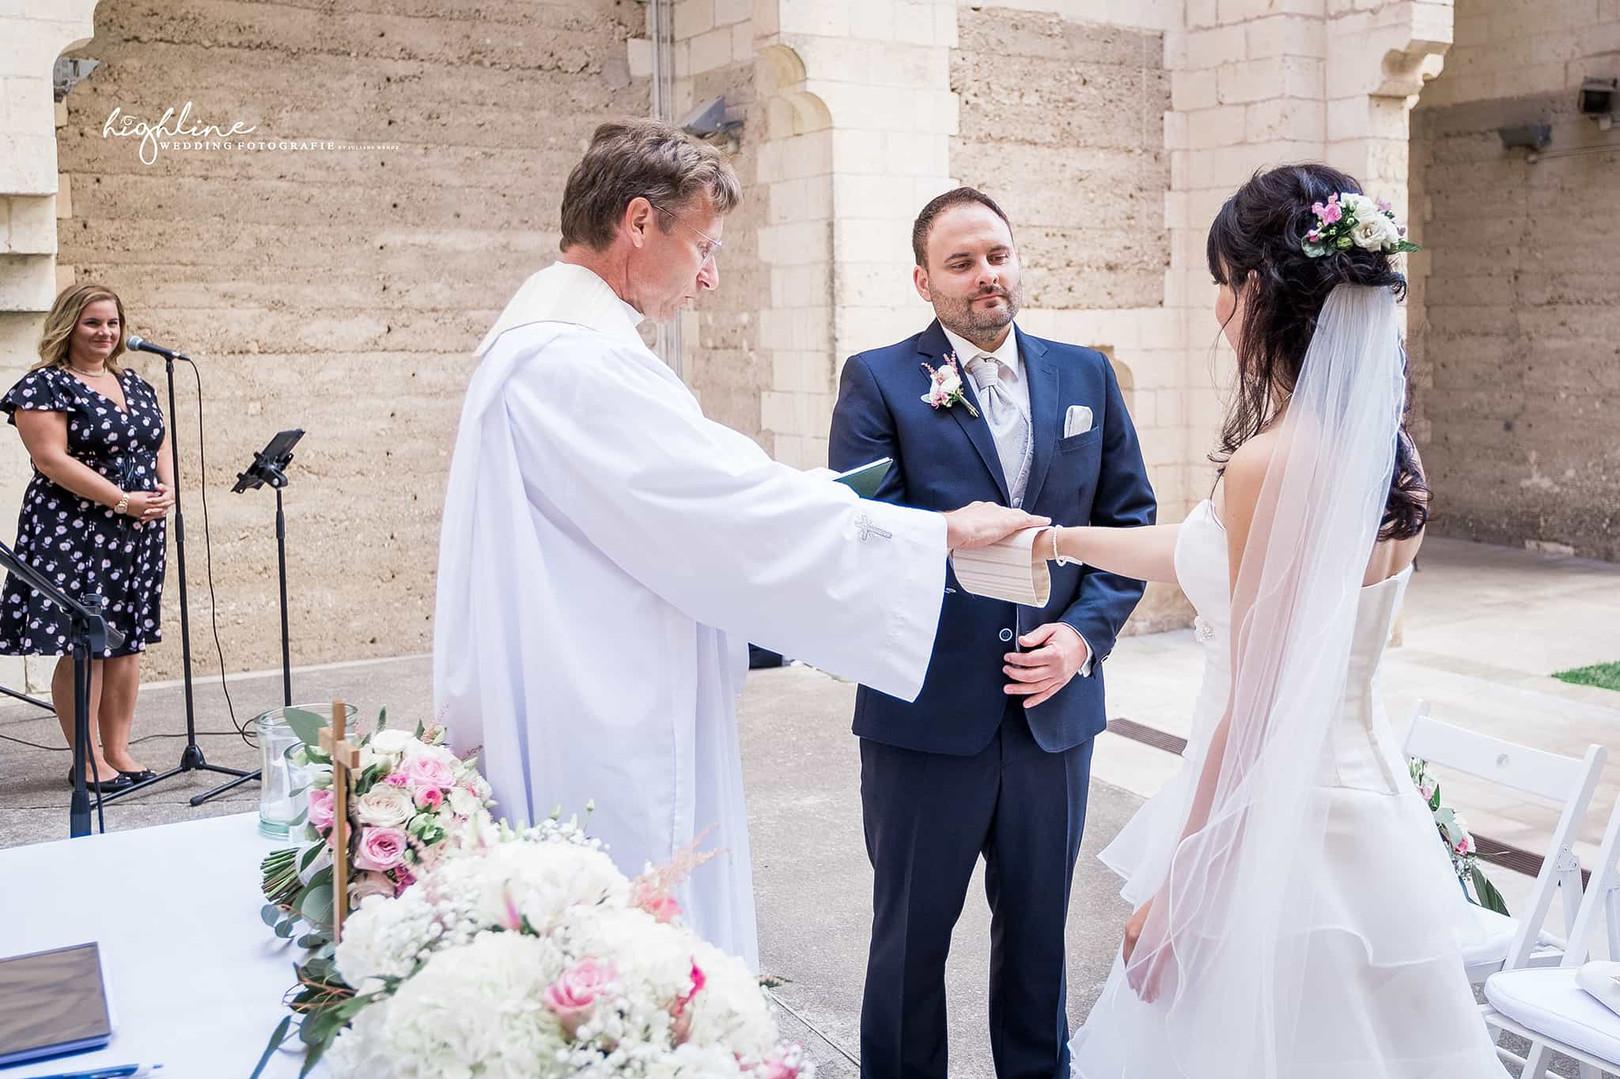 Ehegelöbnis bei Trauung in Mallorca